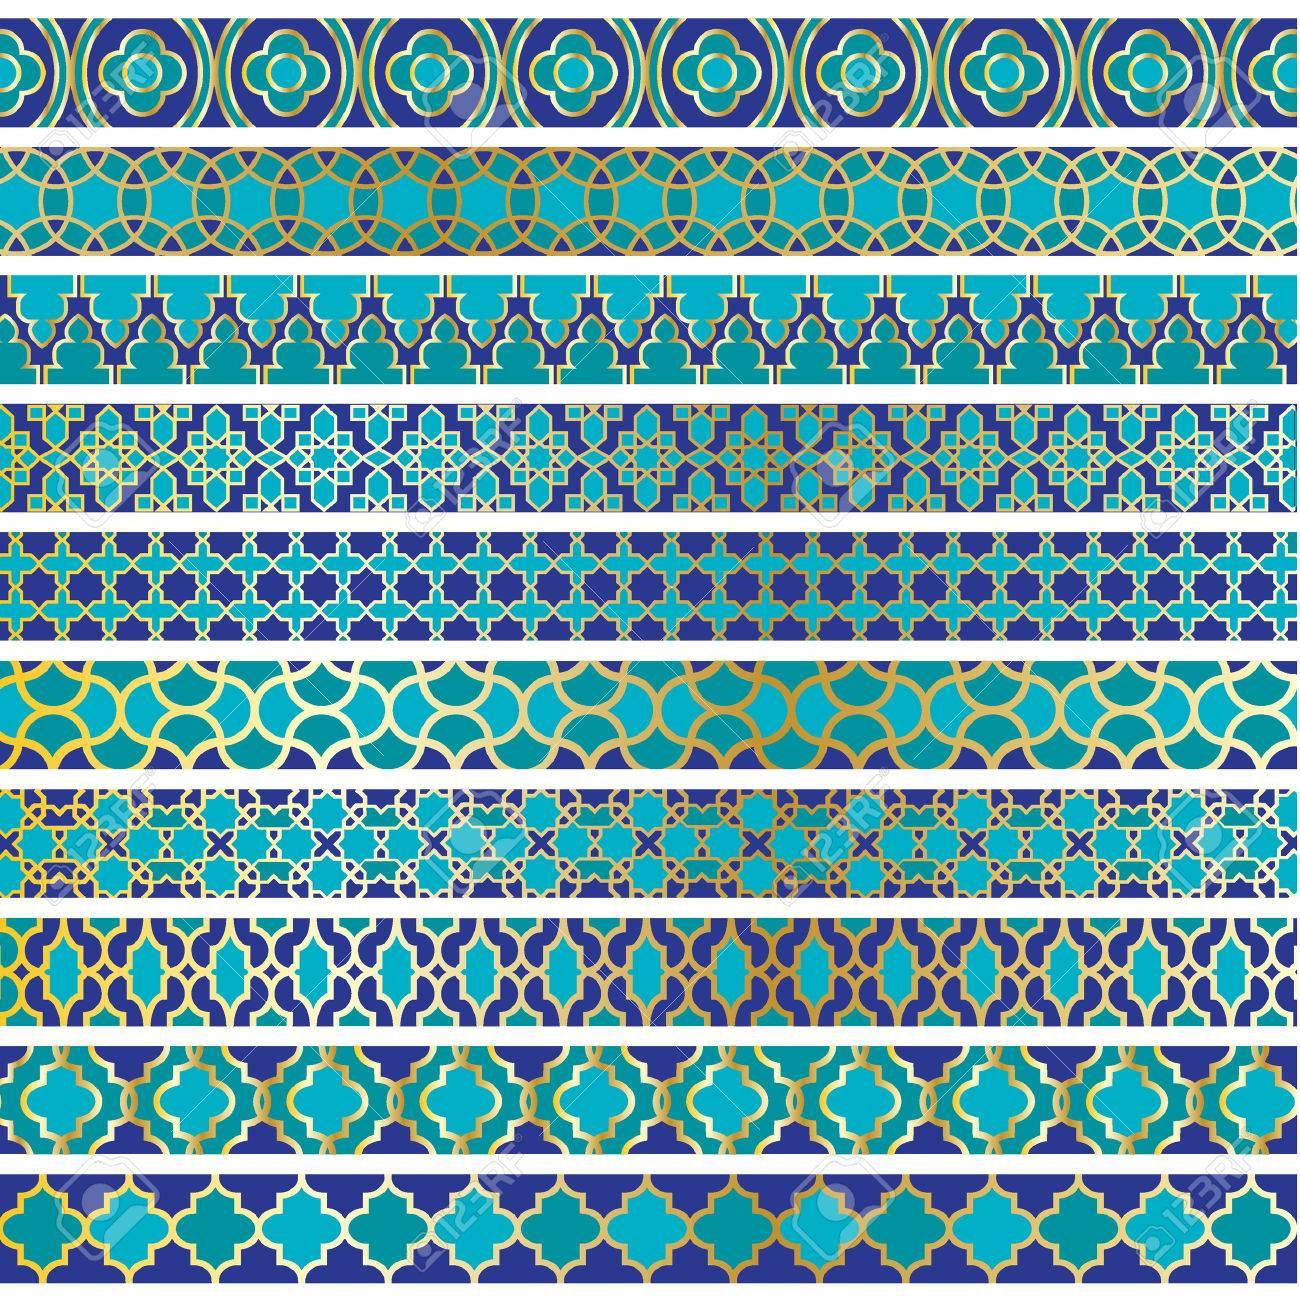 blue moroccan borders - 36005524